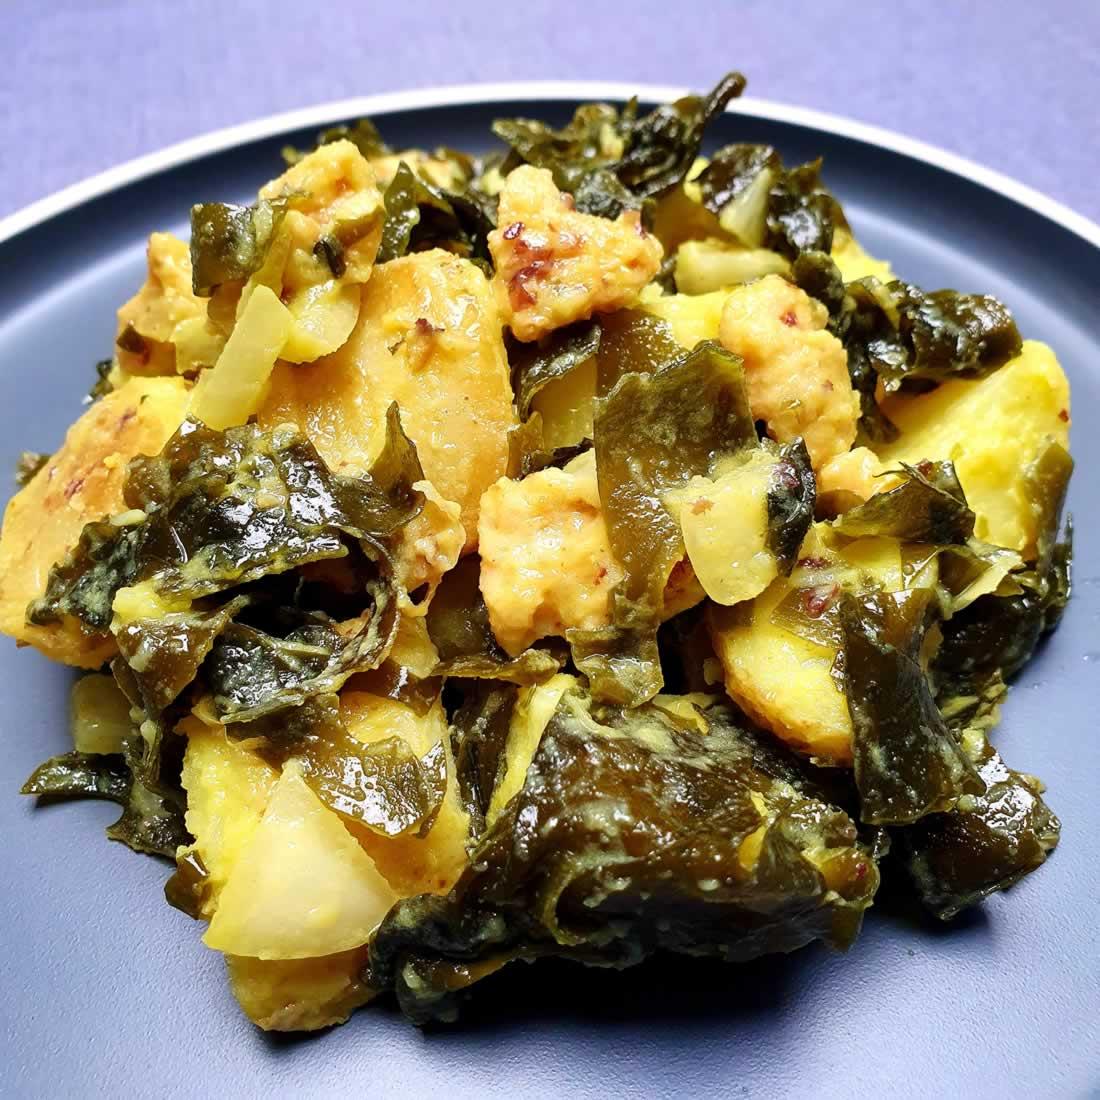 Salade de pommes de terre vegan (façon terre-mer)